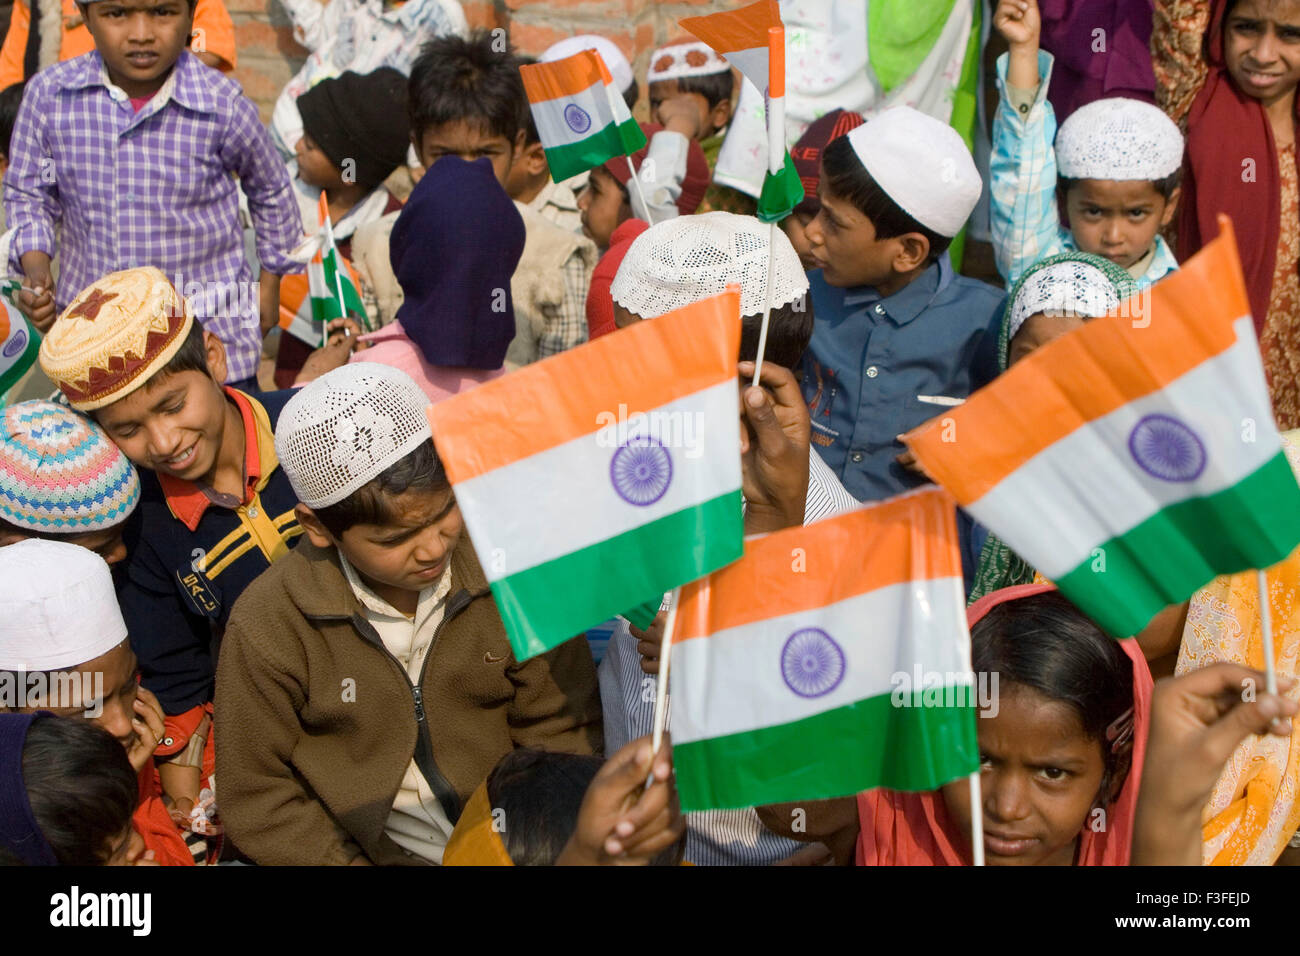 Muslim Children With Indian Flag On Republic Day 26th January In Varanasi Uttar Pradesh India Stock Photo Alamy Happy republic day images 2021 muslim